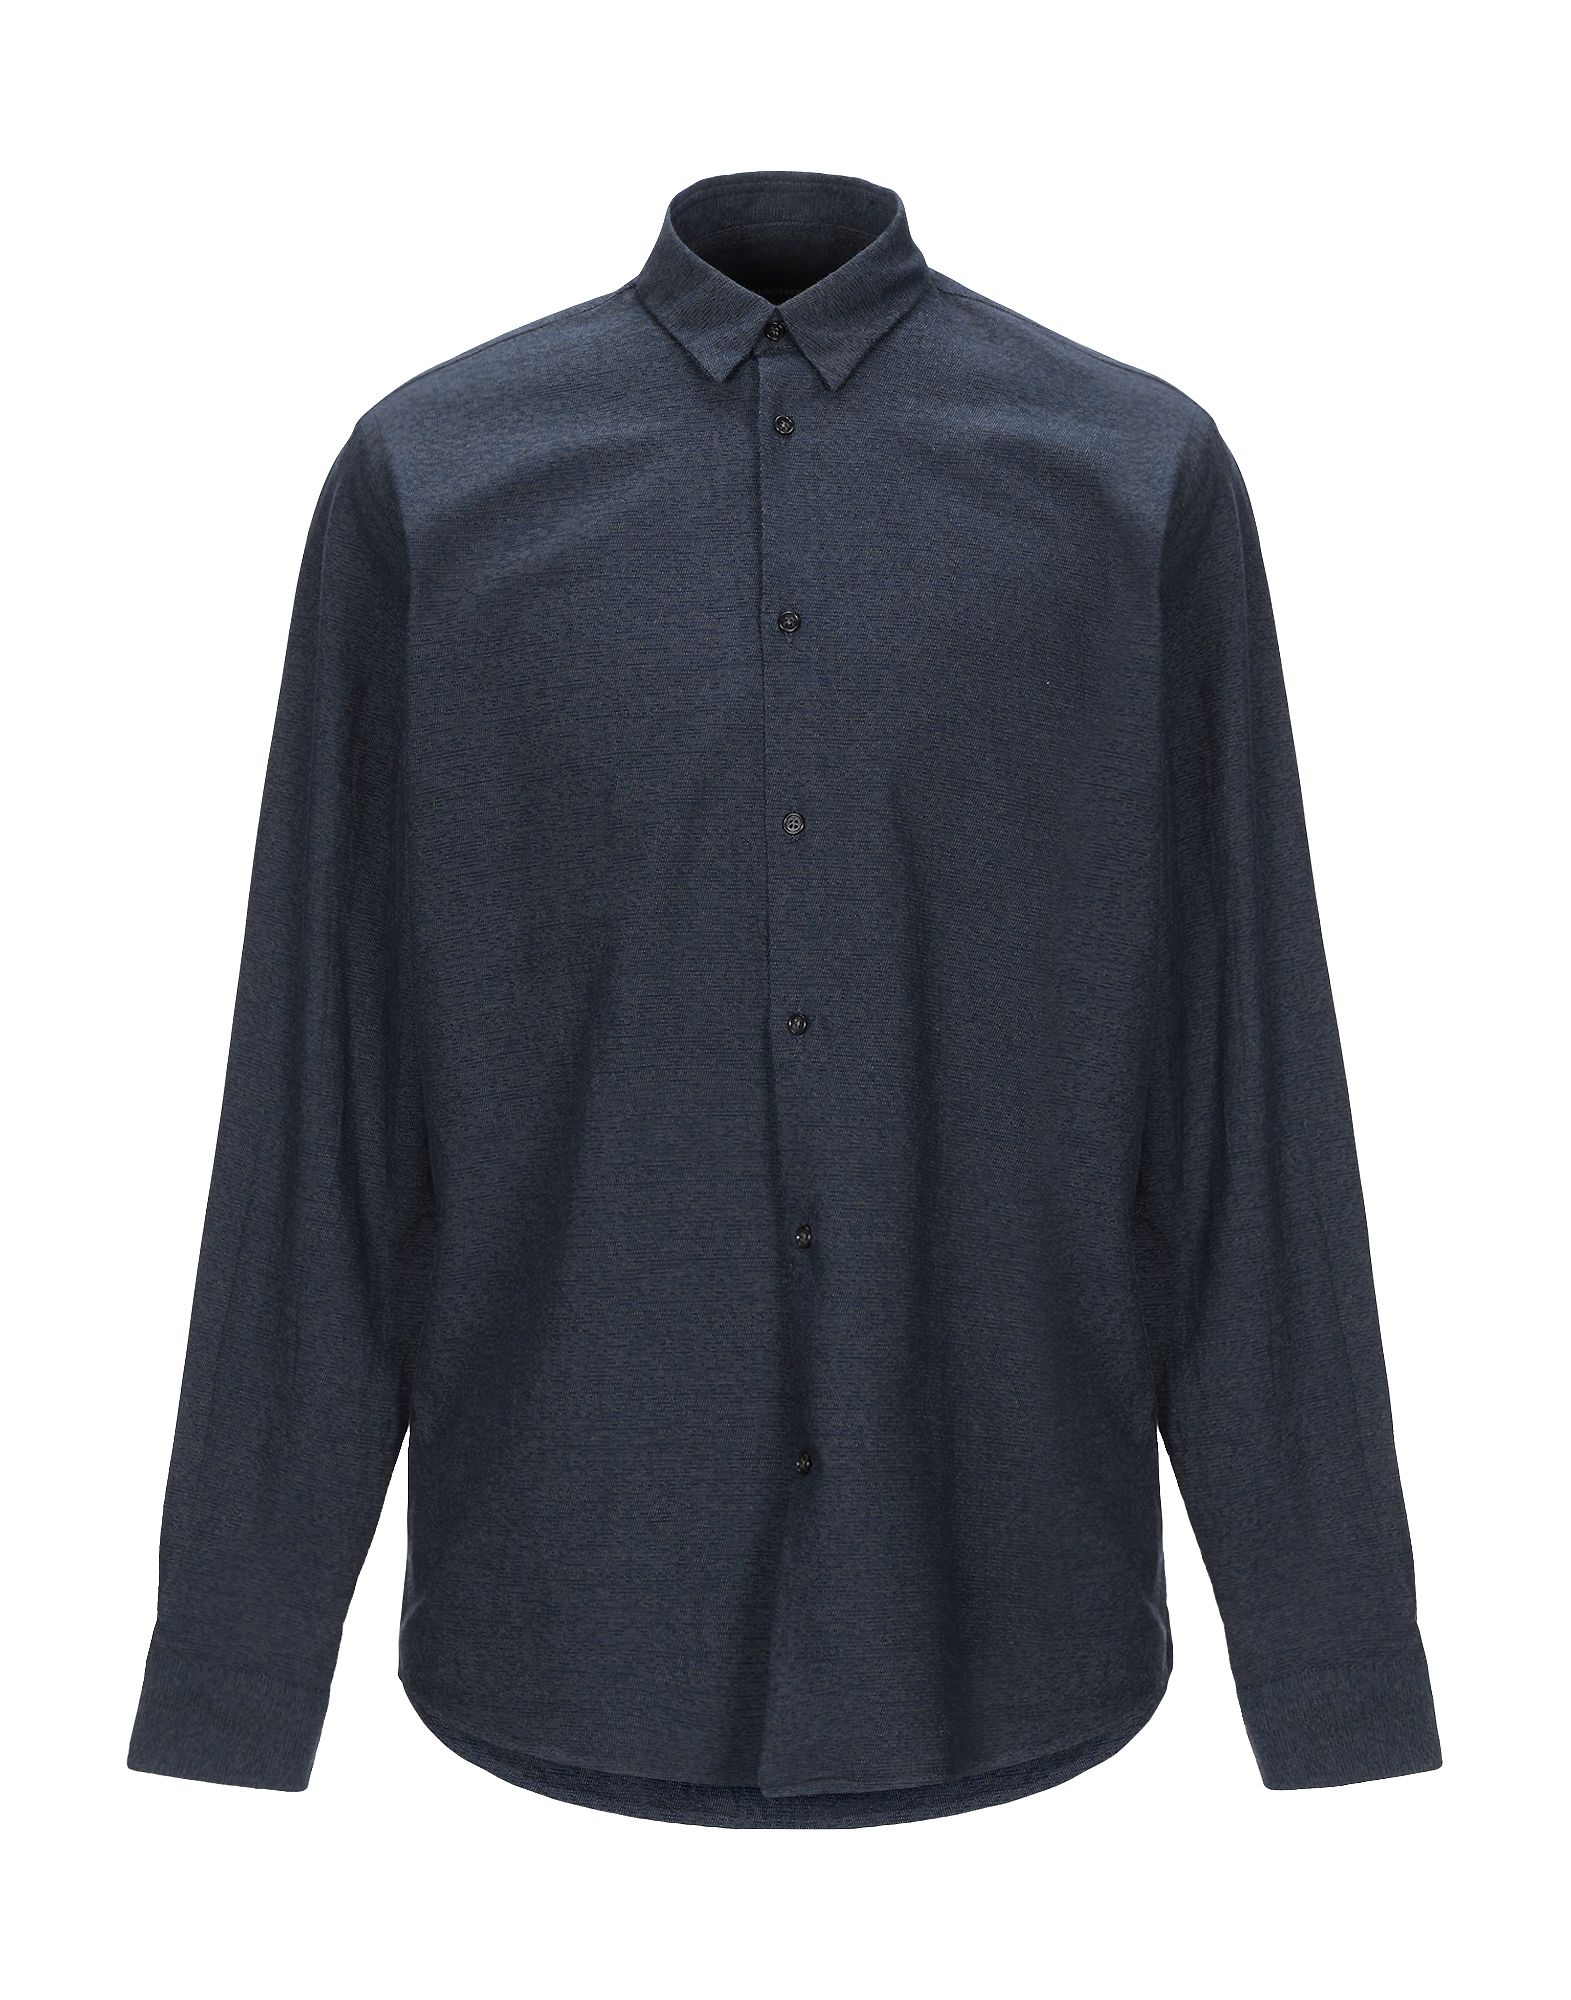 Фото - J. LINDEBERG Pубашка j shirt pубашка